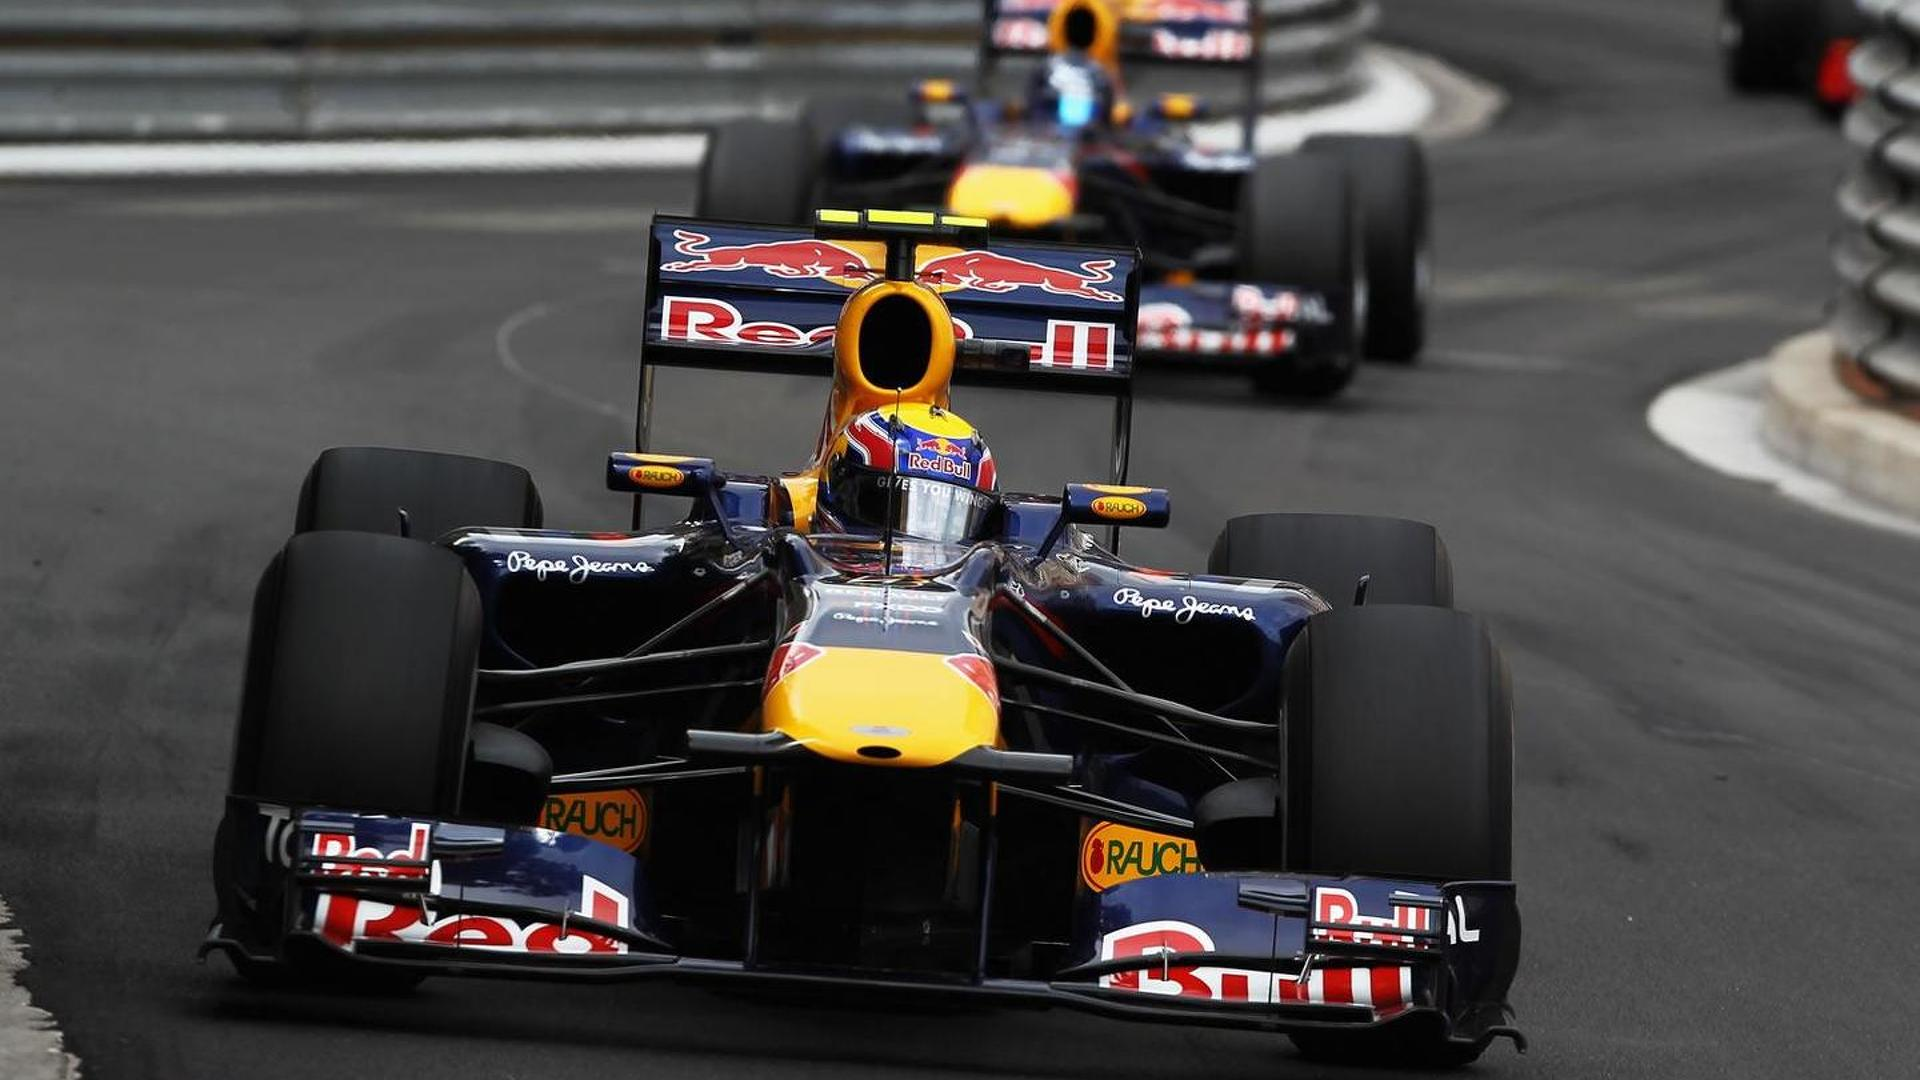 Damage found in Vettel's Barcelona/Monaco chassis